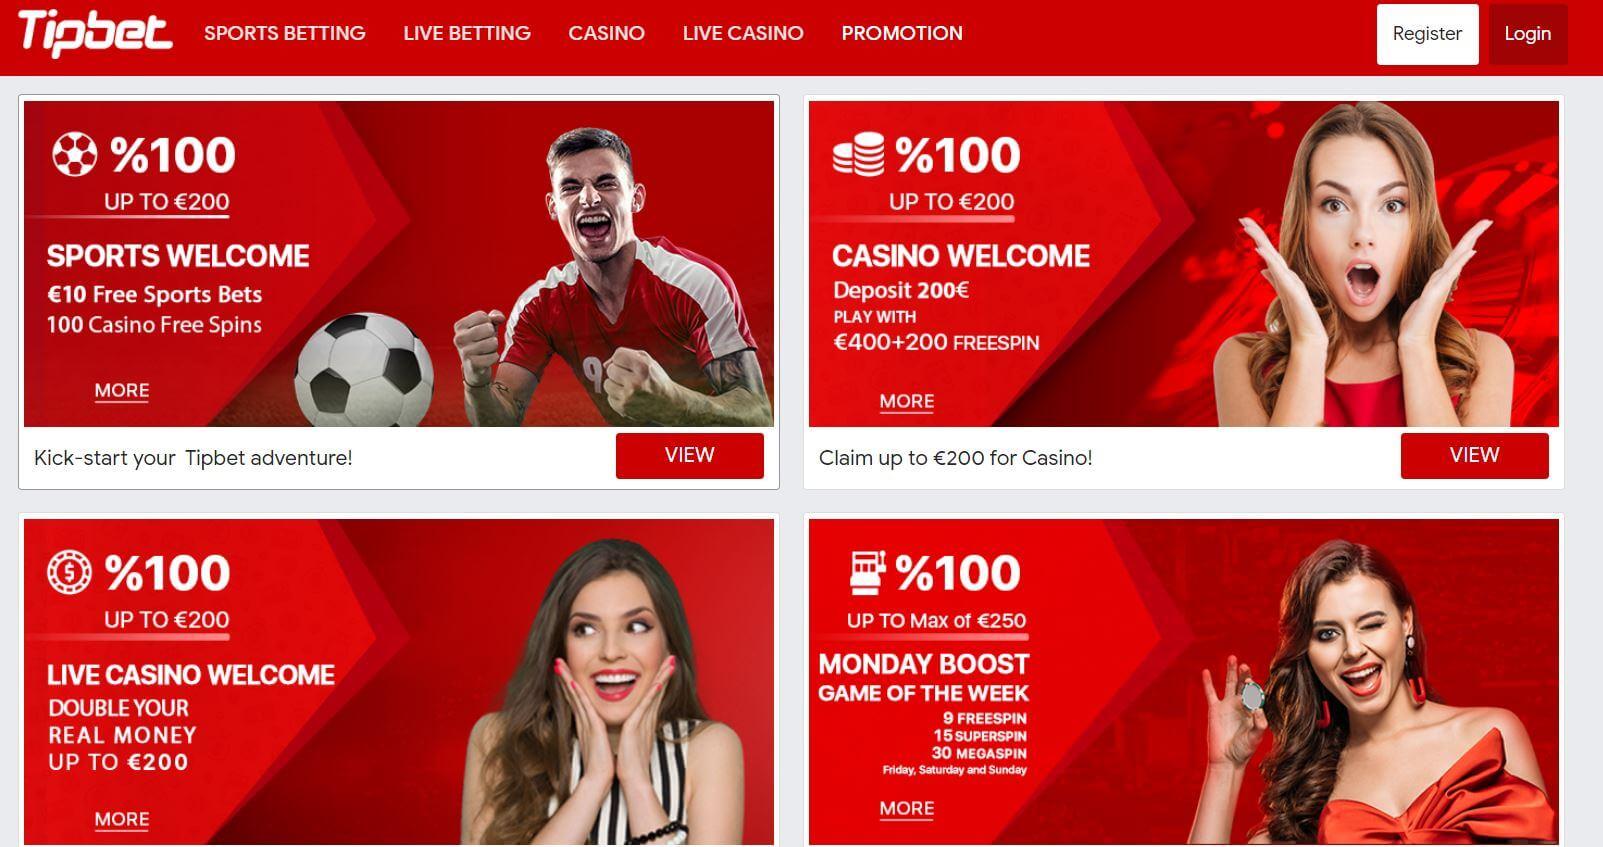 Tipbet Casino Promotions